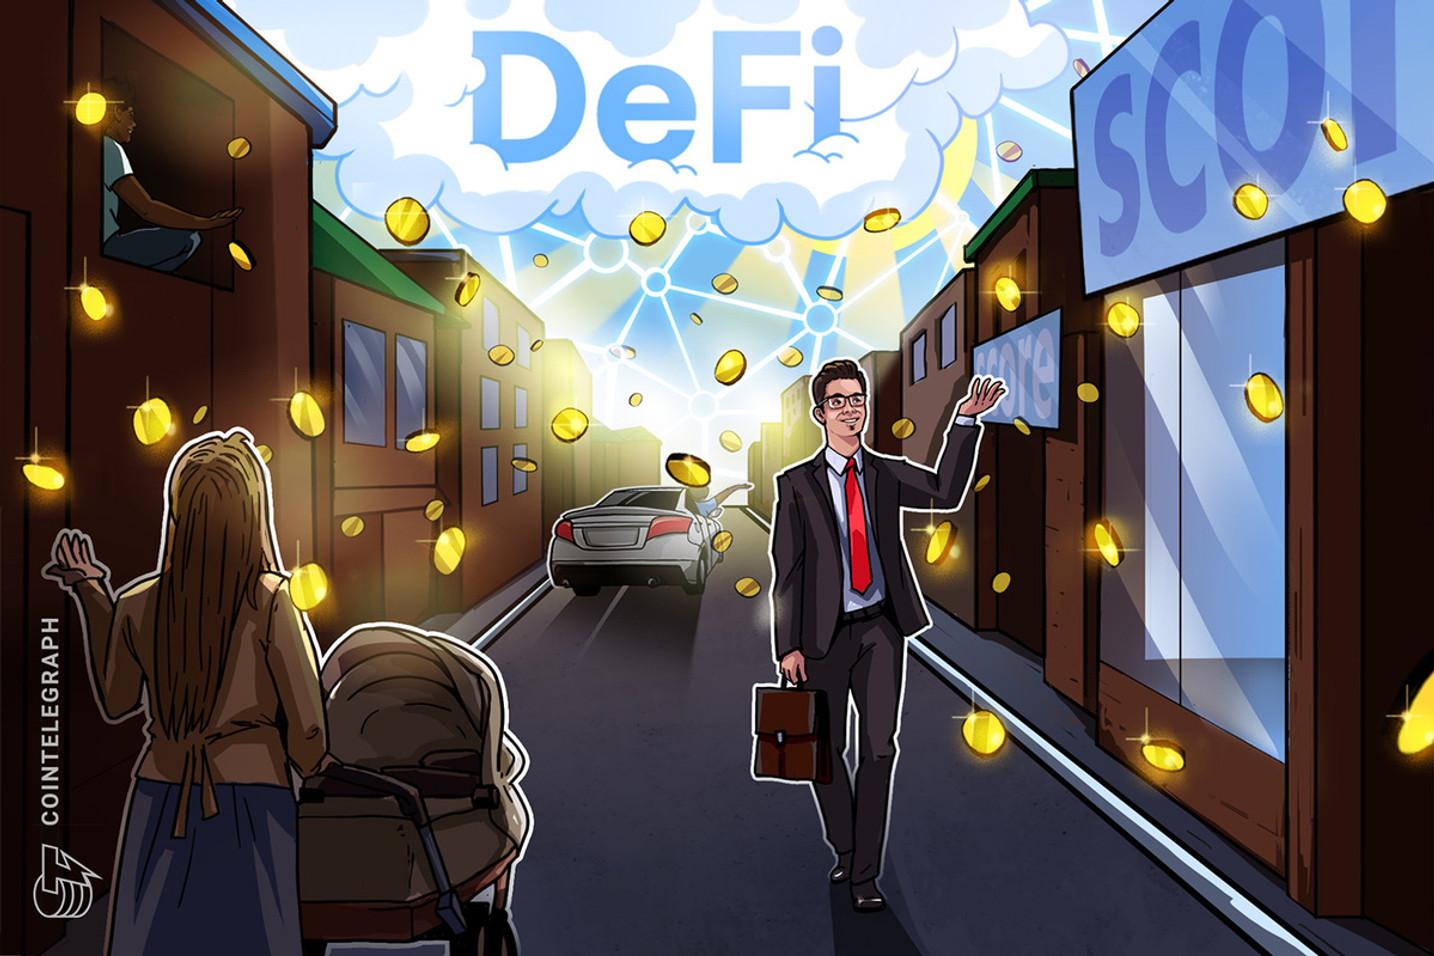 DeFiプロジェクトは、「聖杯」を求めている現在、苦痛なジレンマに直面しています。